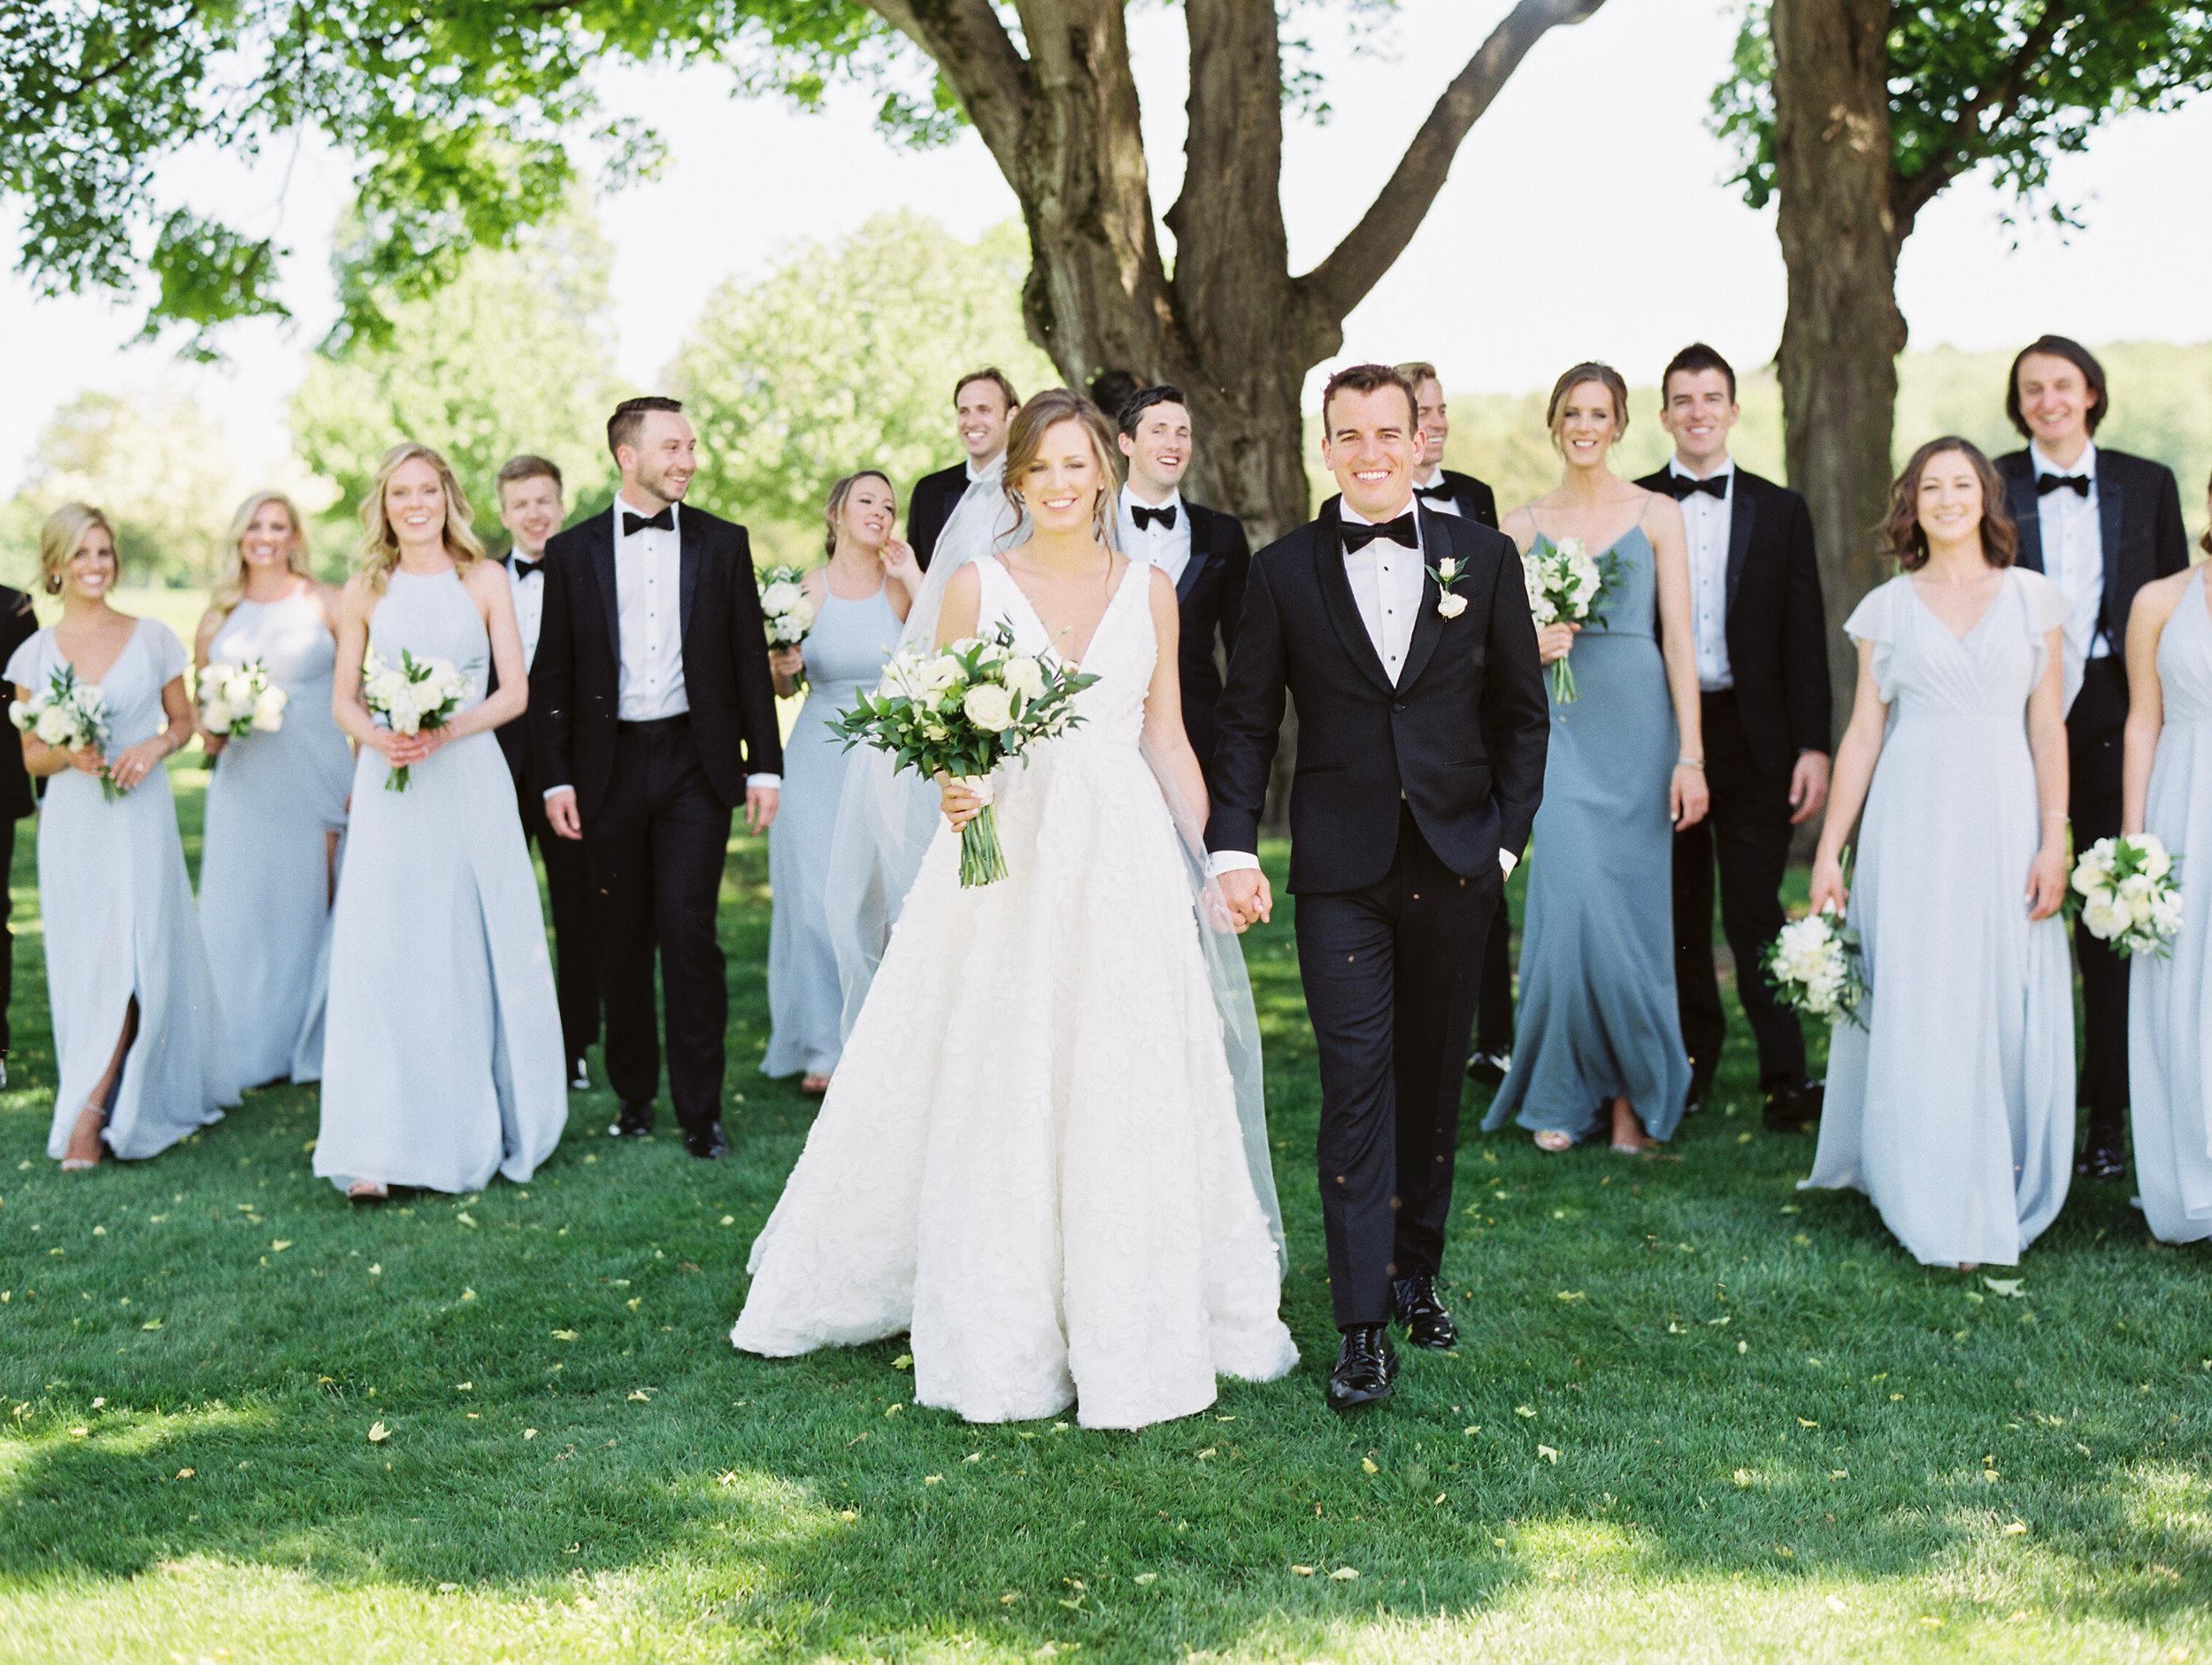 DeGuilio+Wedding+Bridal+Partyf-4.jpg